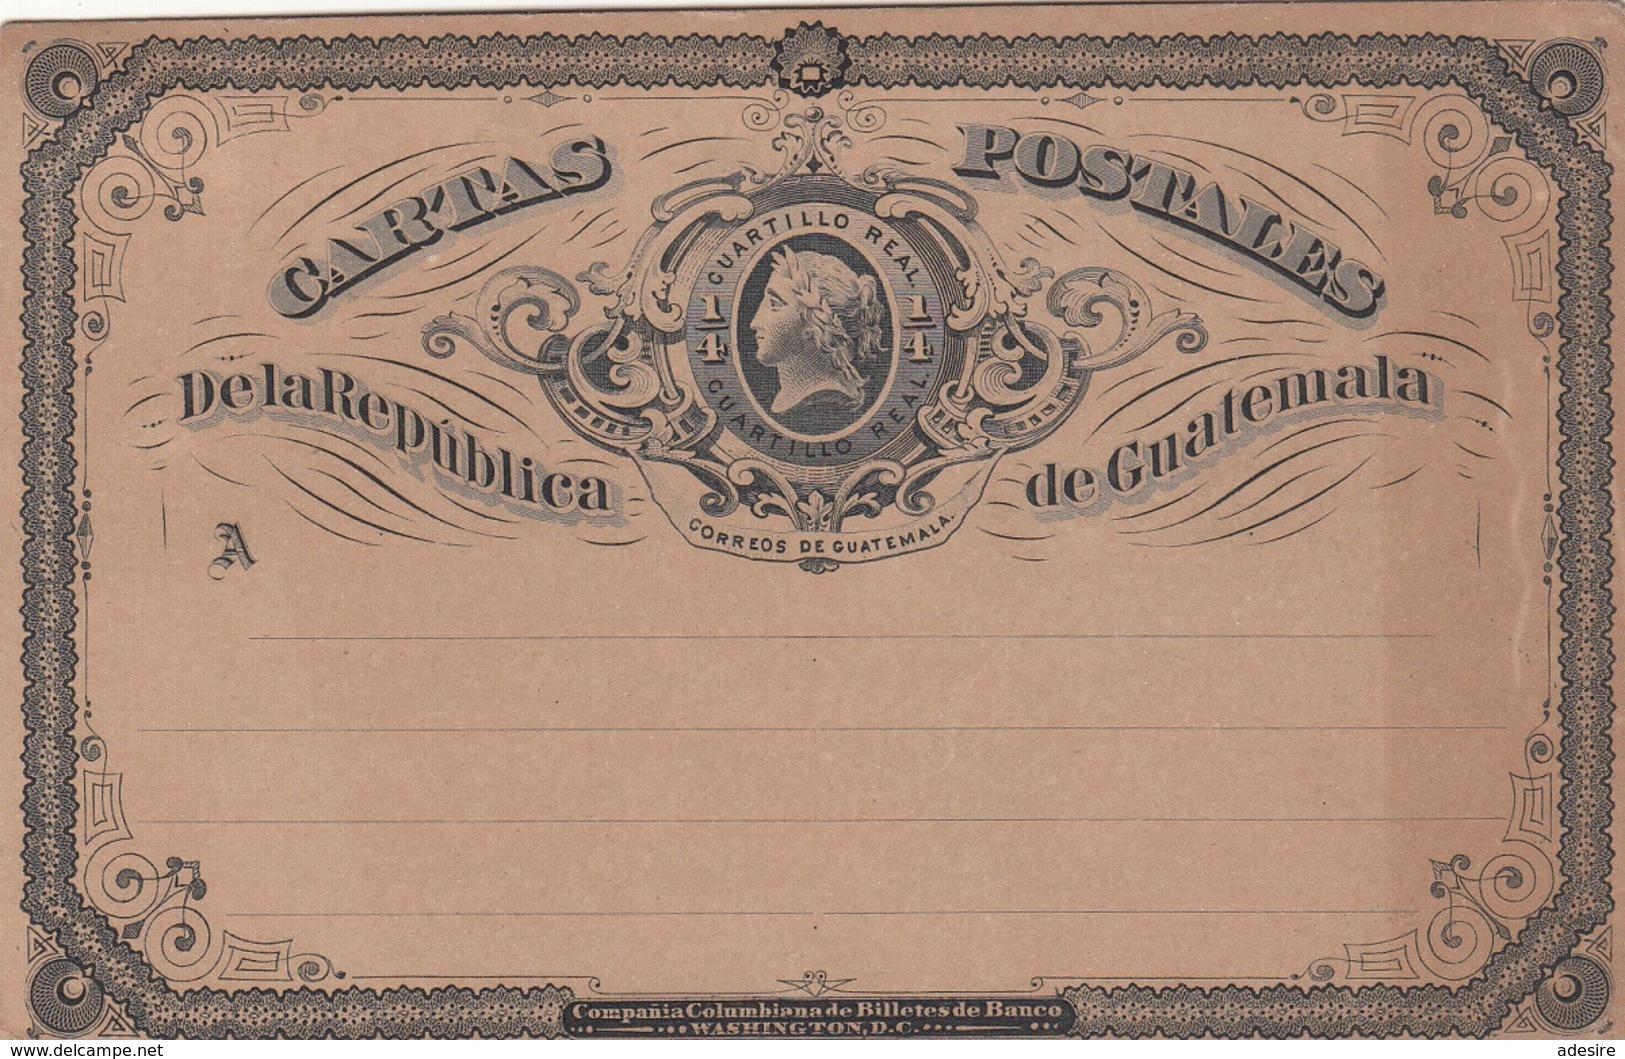 GUATEMALA 189? - 1/4 QUARTILLO REAL GANZSACHE Auf Karte *, Rückseitige Spuren Vom Album - Guatemala